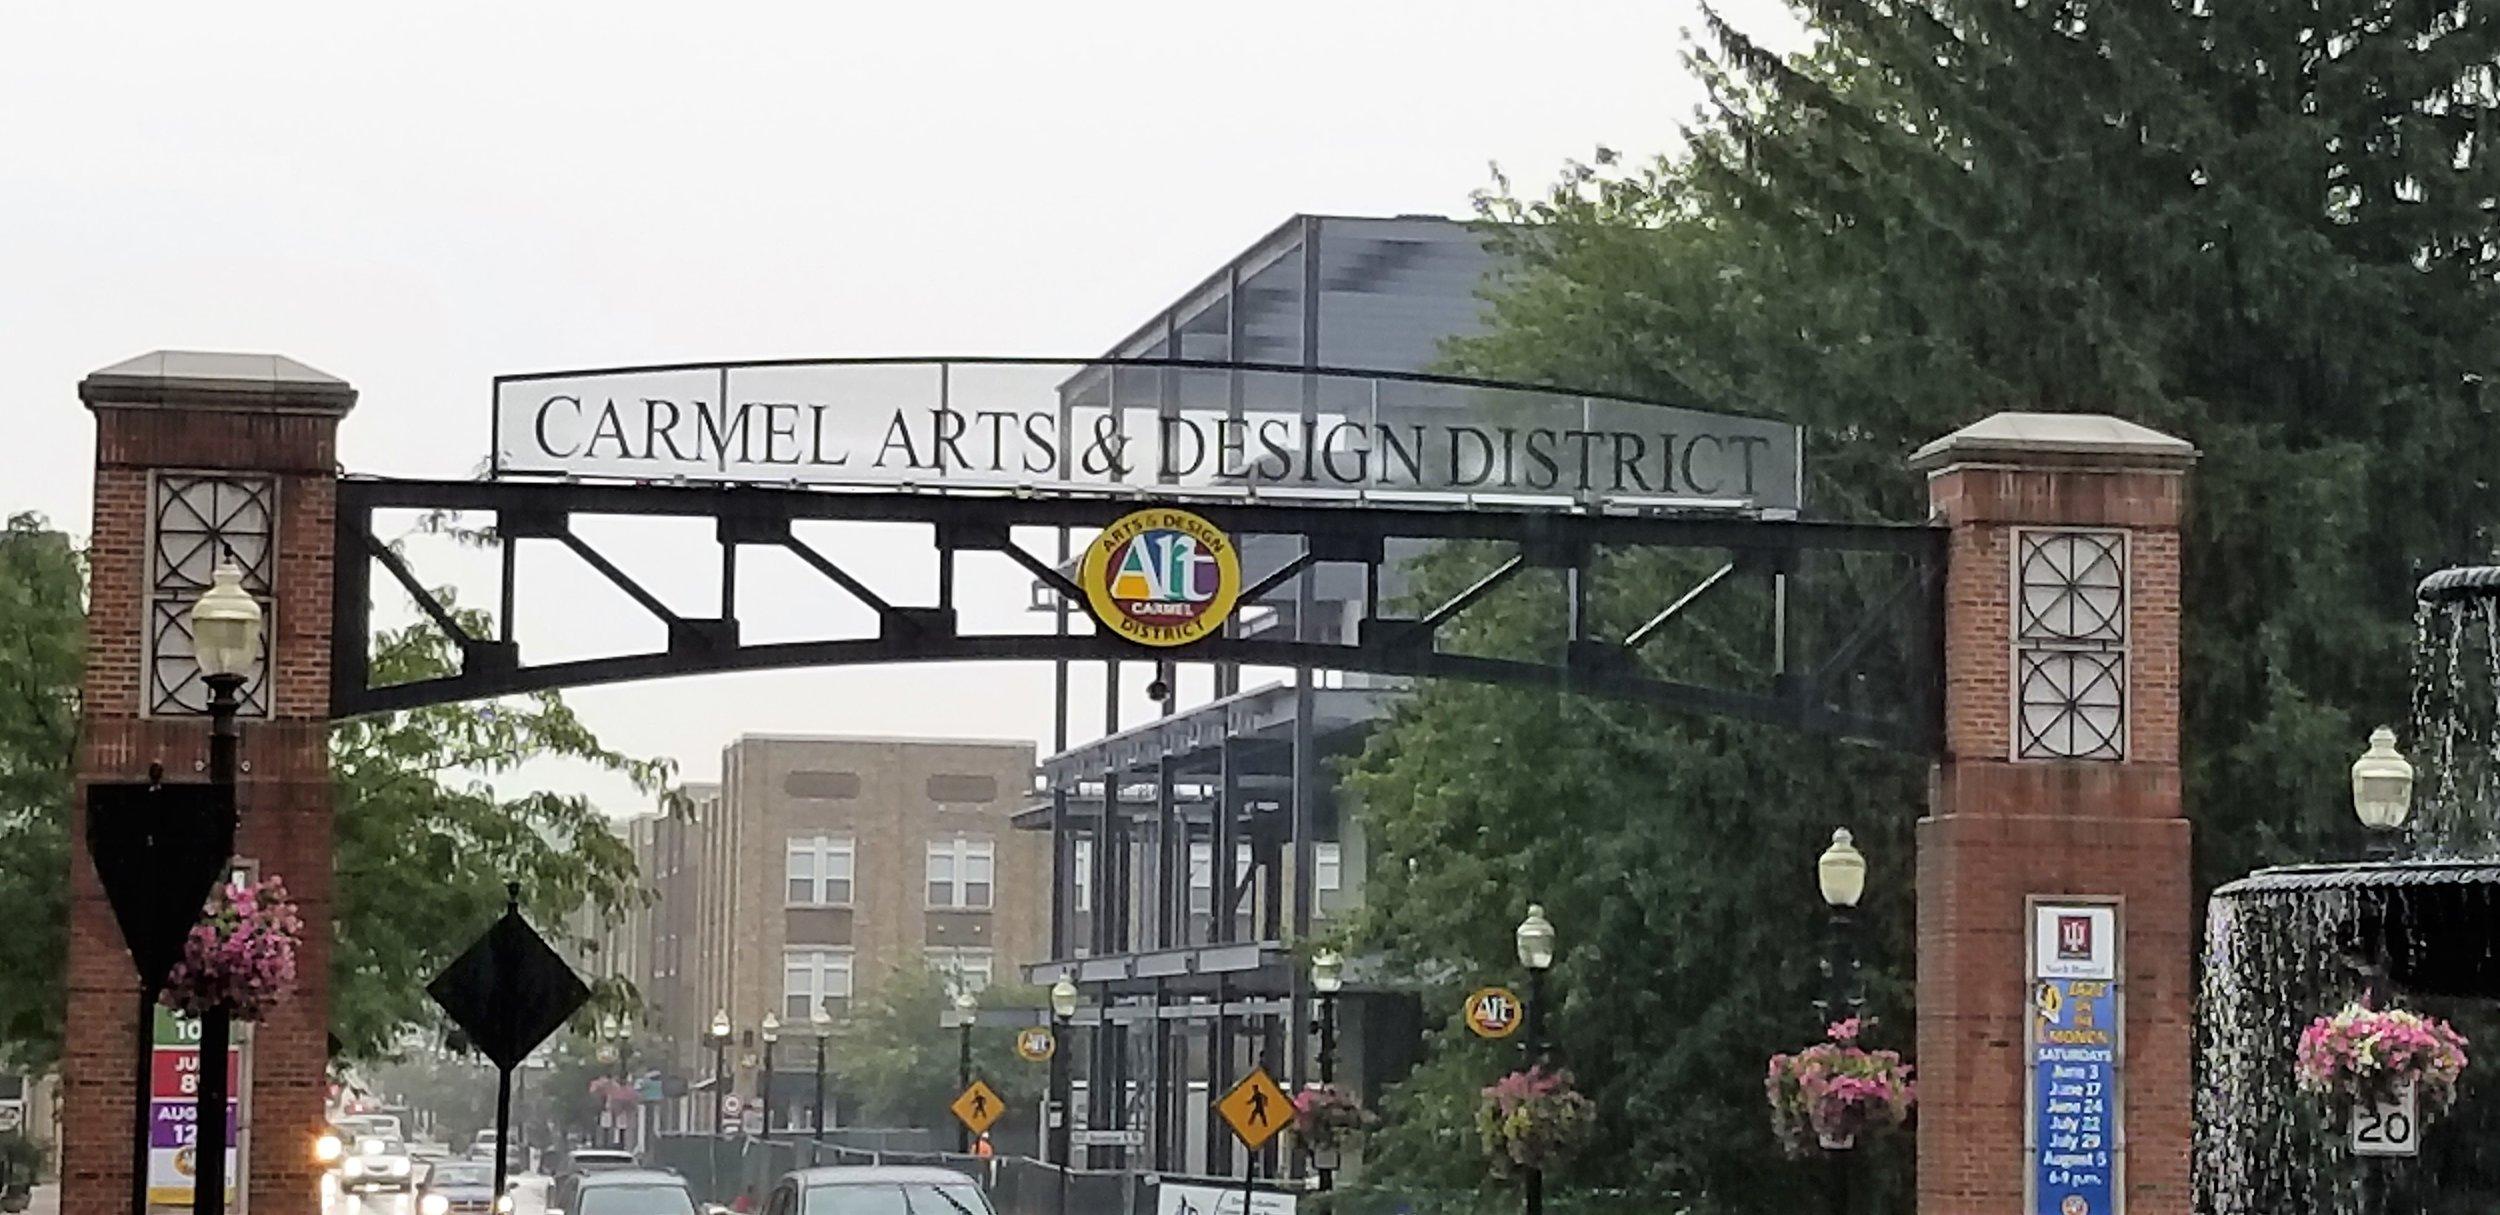 Entrance to Carmel's Arts & Design District.